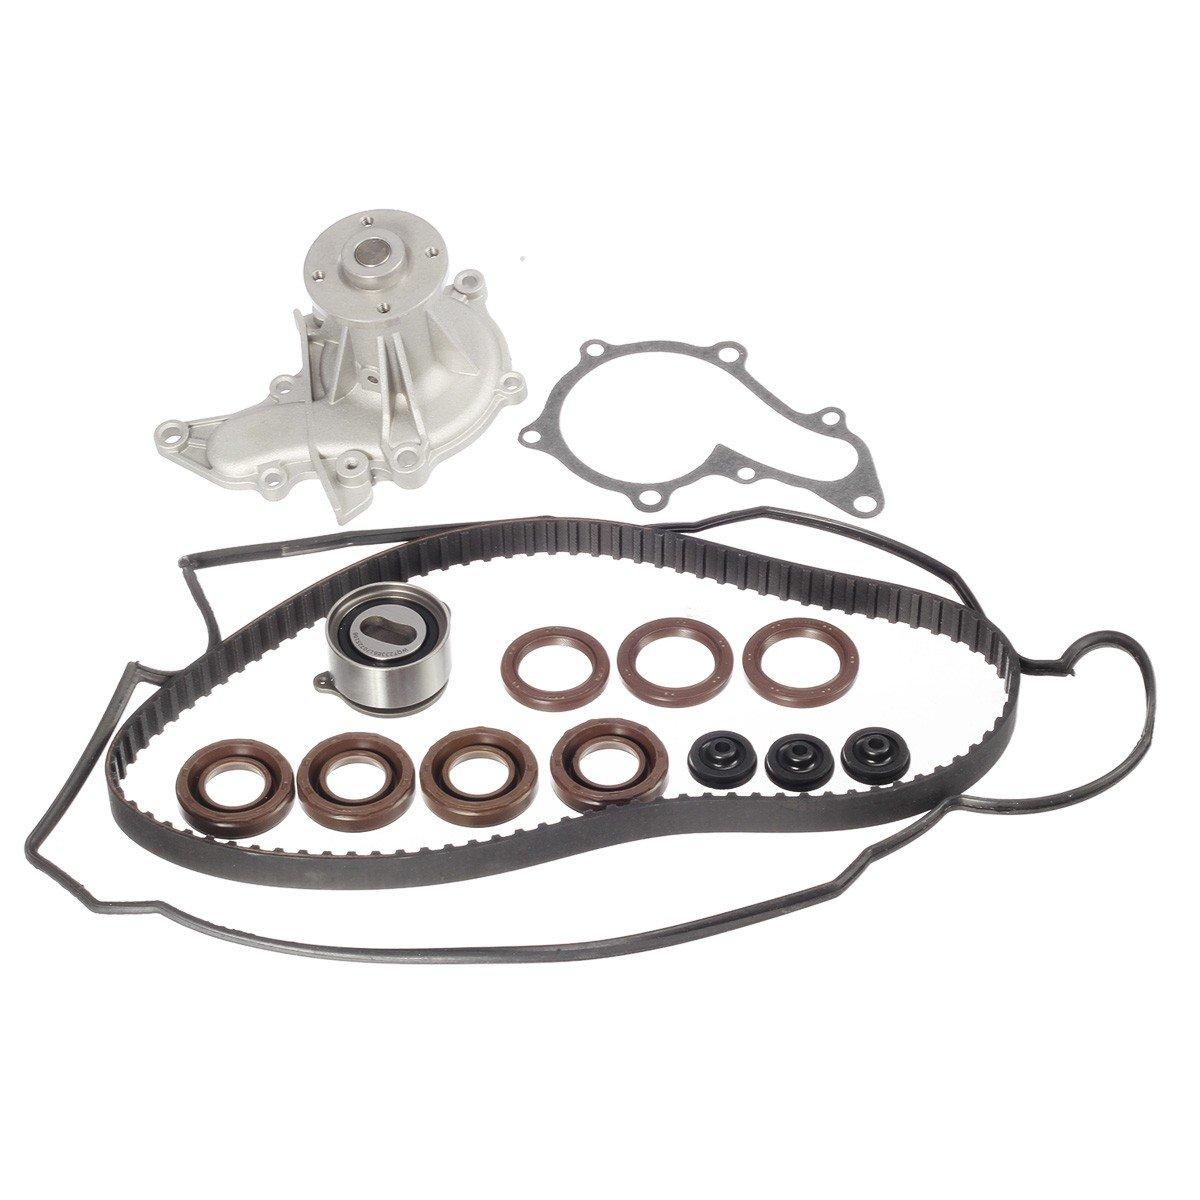 TBK236WPT Timing Belt Kit Valve Cover Gasket Water Pump for 1993-1997 Toyota Corolla Geo Prizm 1.6L DOHC 4AFE Vincos